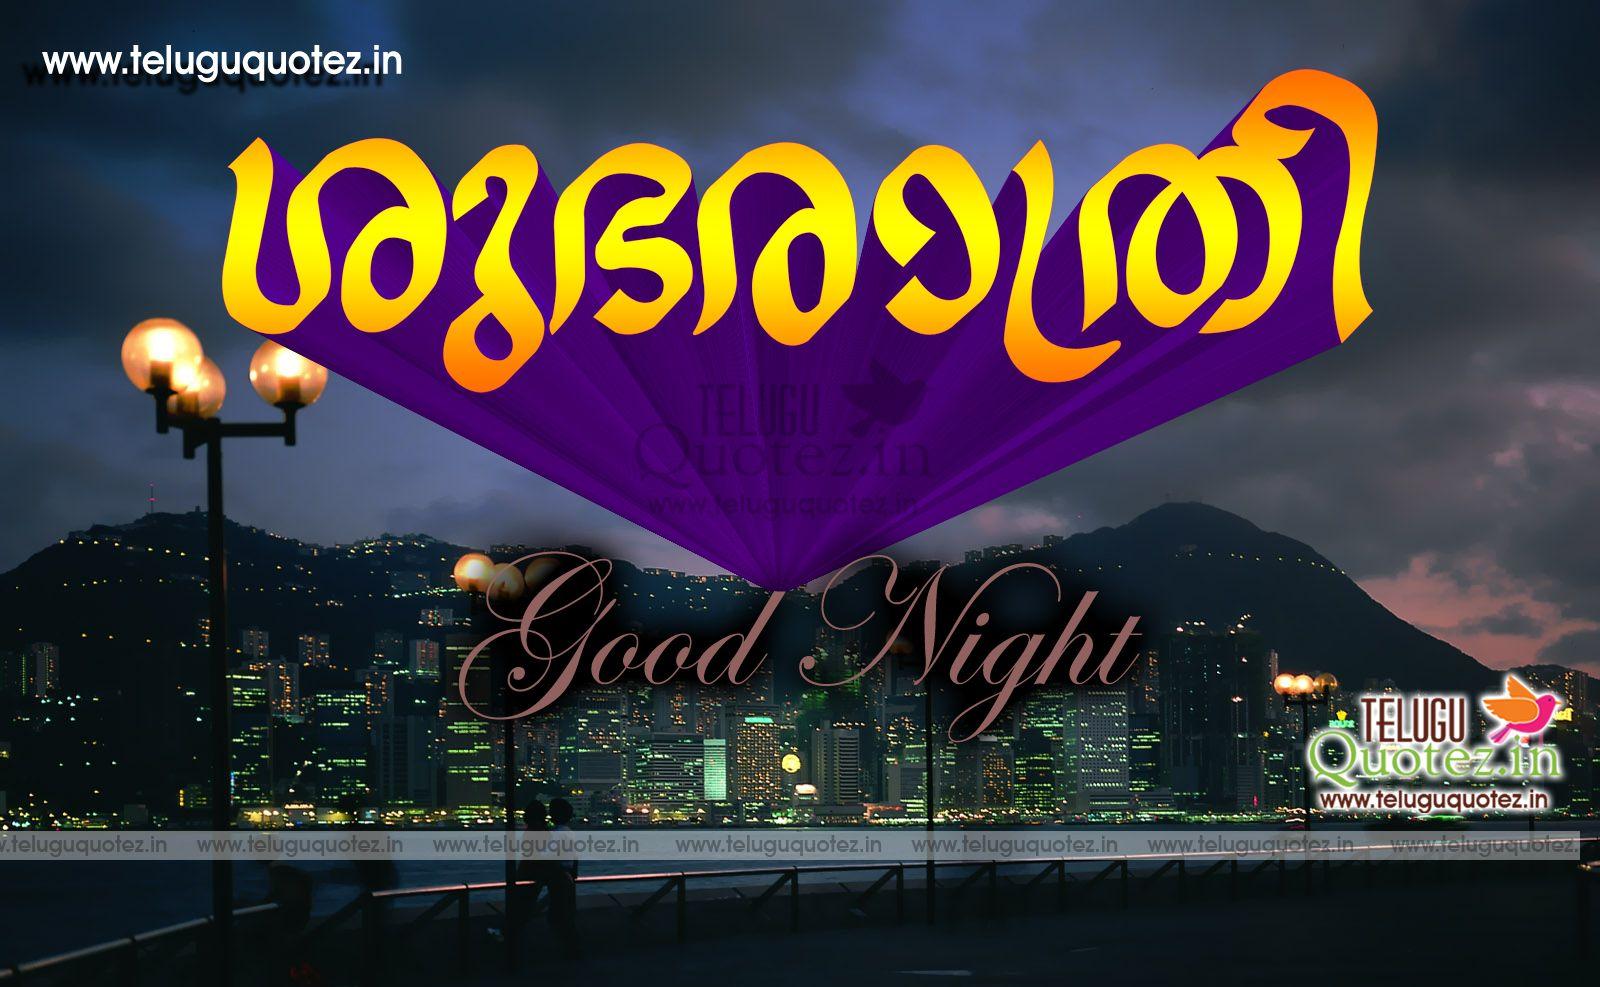 Good night quotes in malayalam language teluguquotez telugu good night quotes in malayalam language teluguquotez altavistaventures Image collections